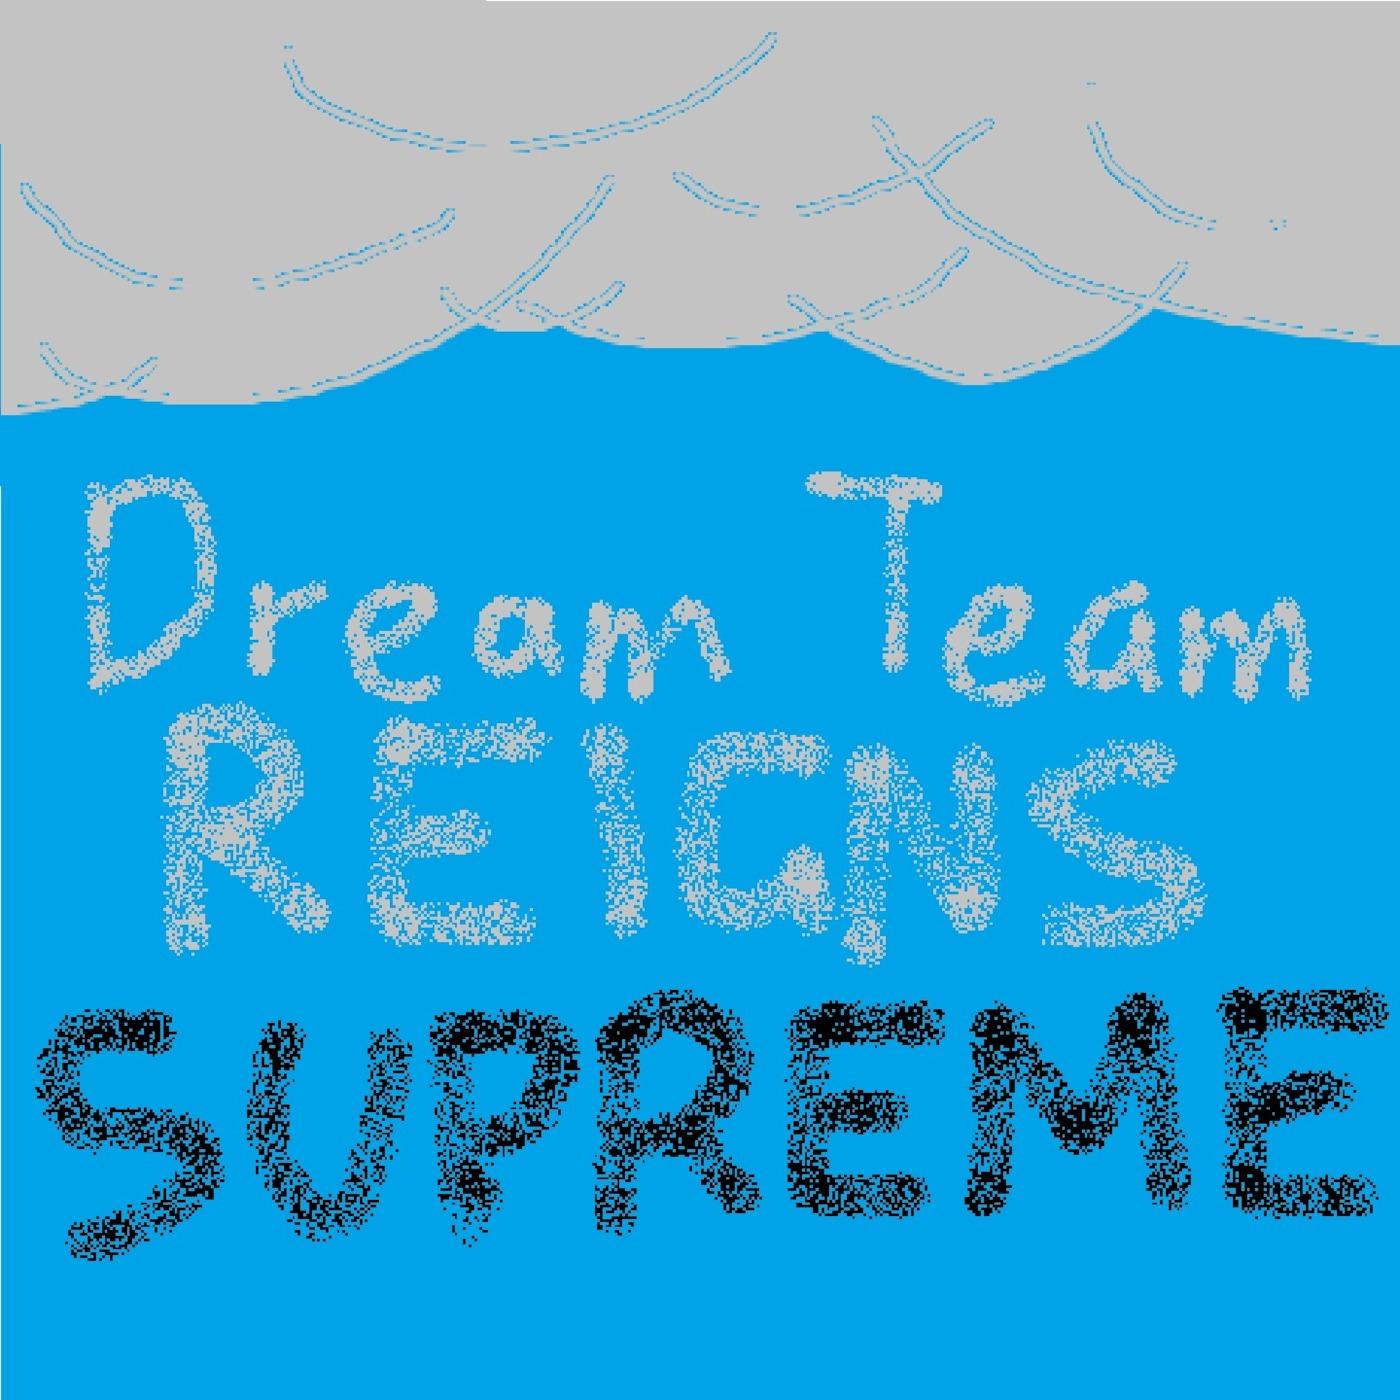 DreamTeamReignsSupreme's Podcast